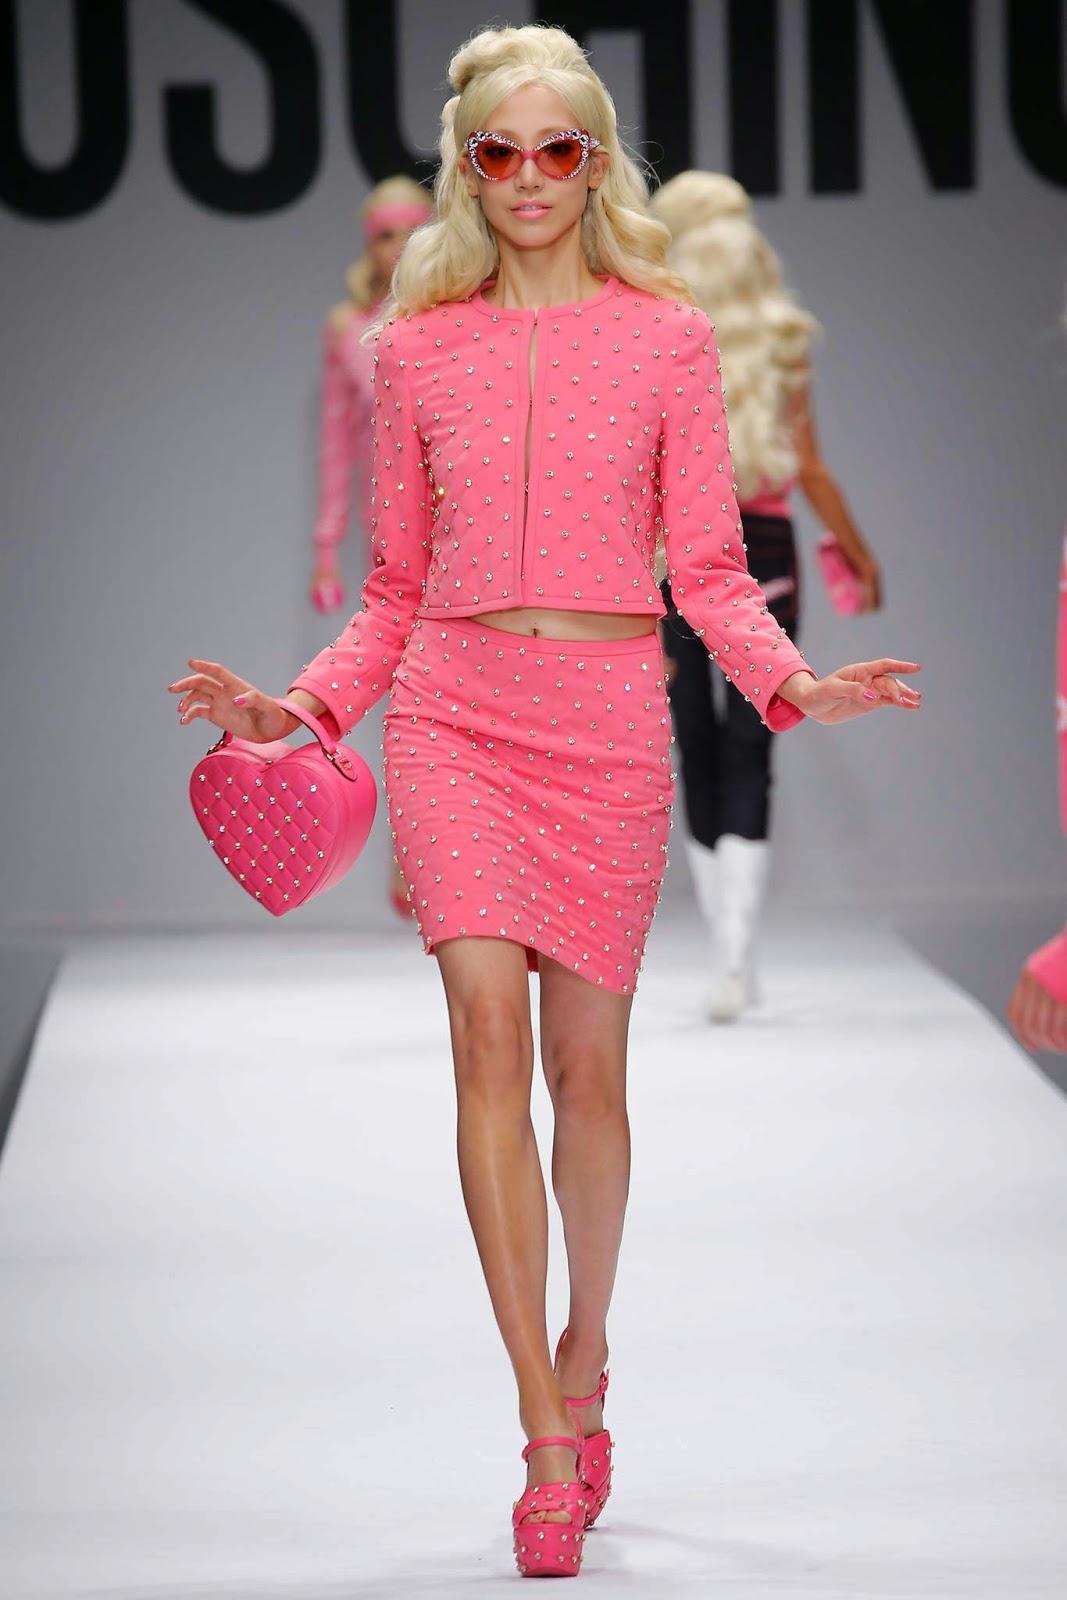 Spring Summer Fashion Show Themes